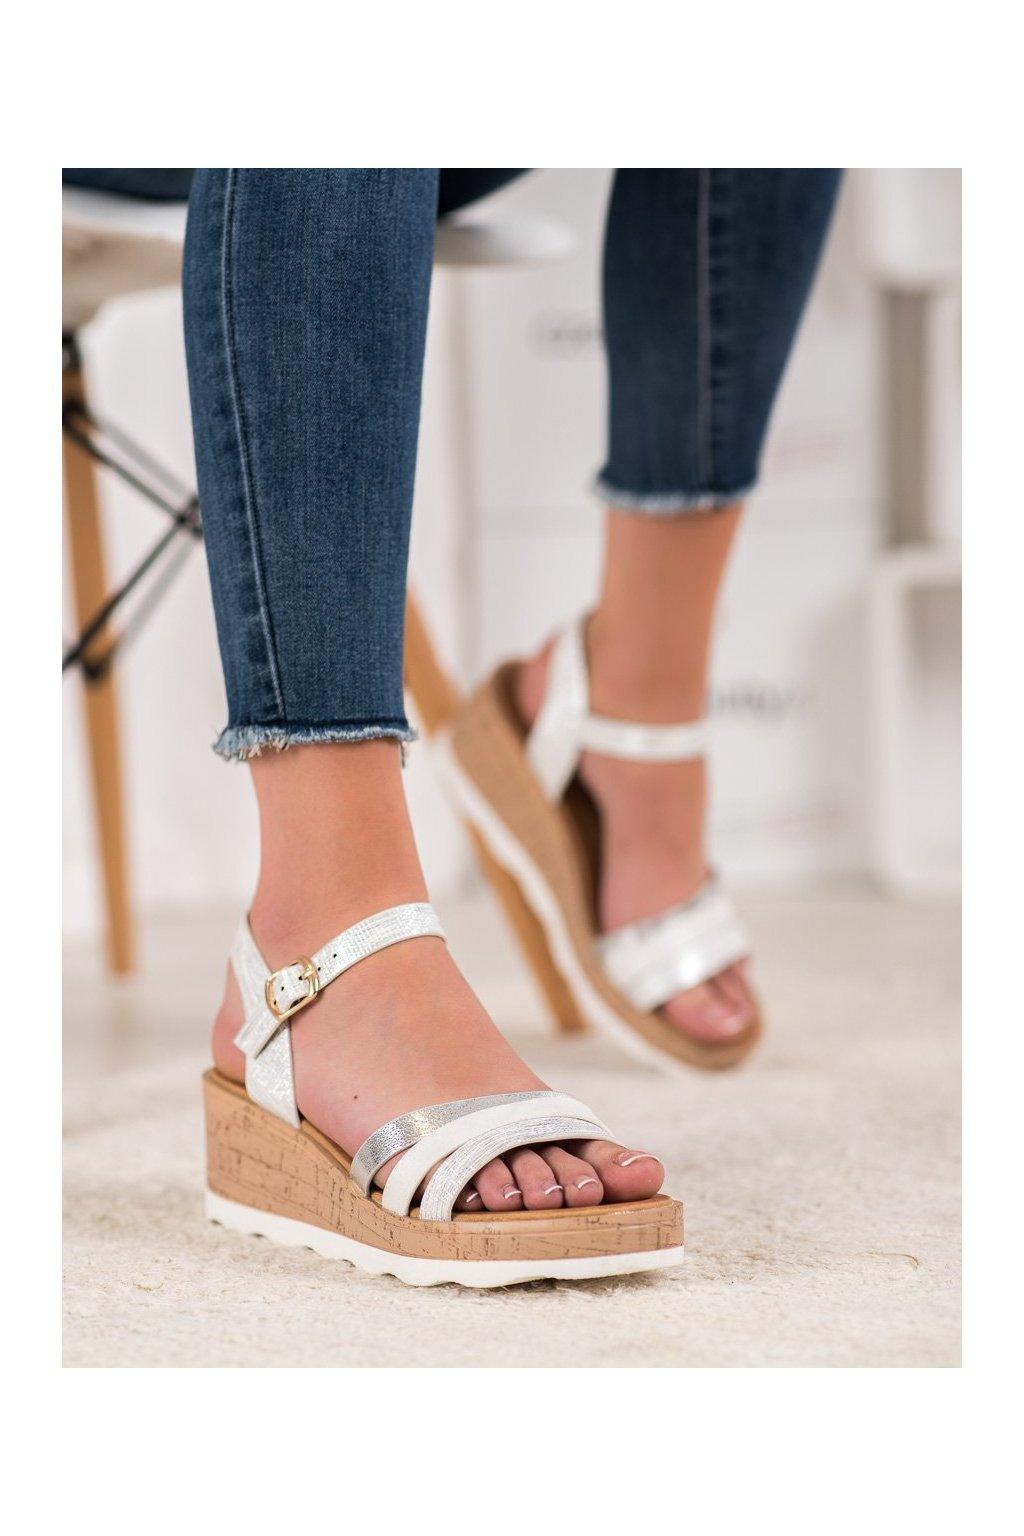 Biele sandále Weide kod Y612W